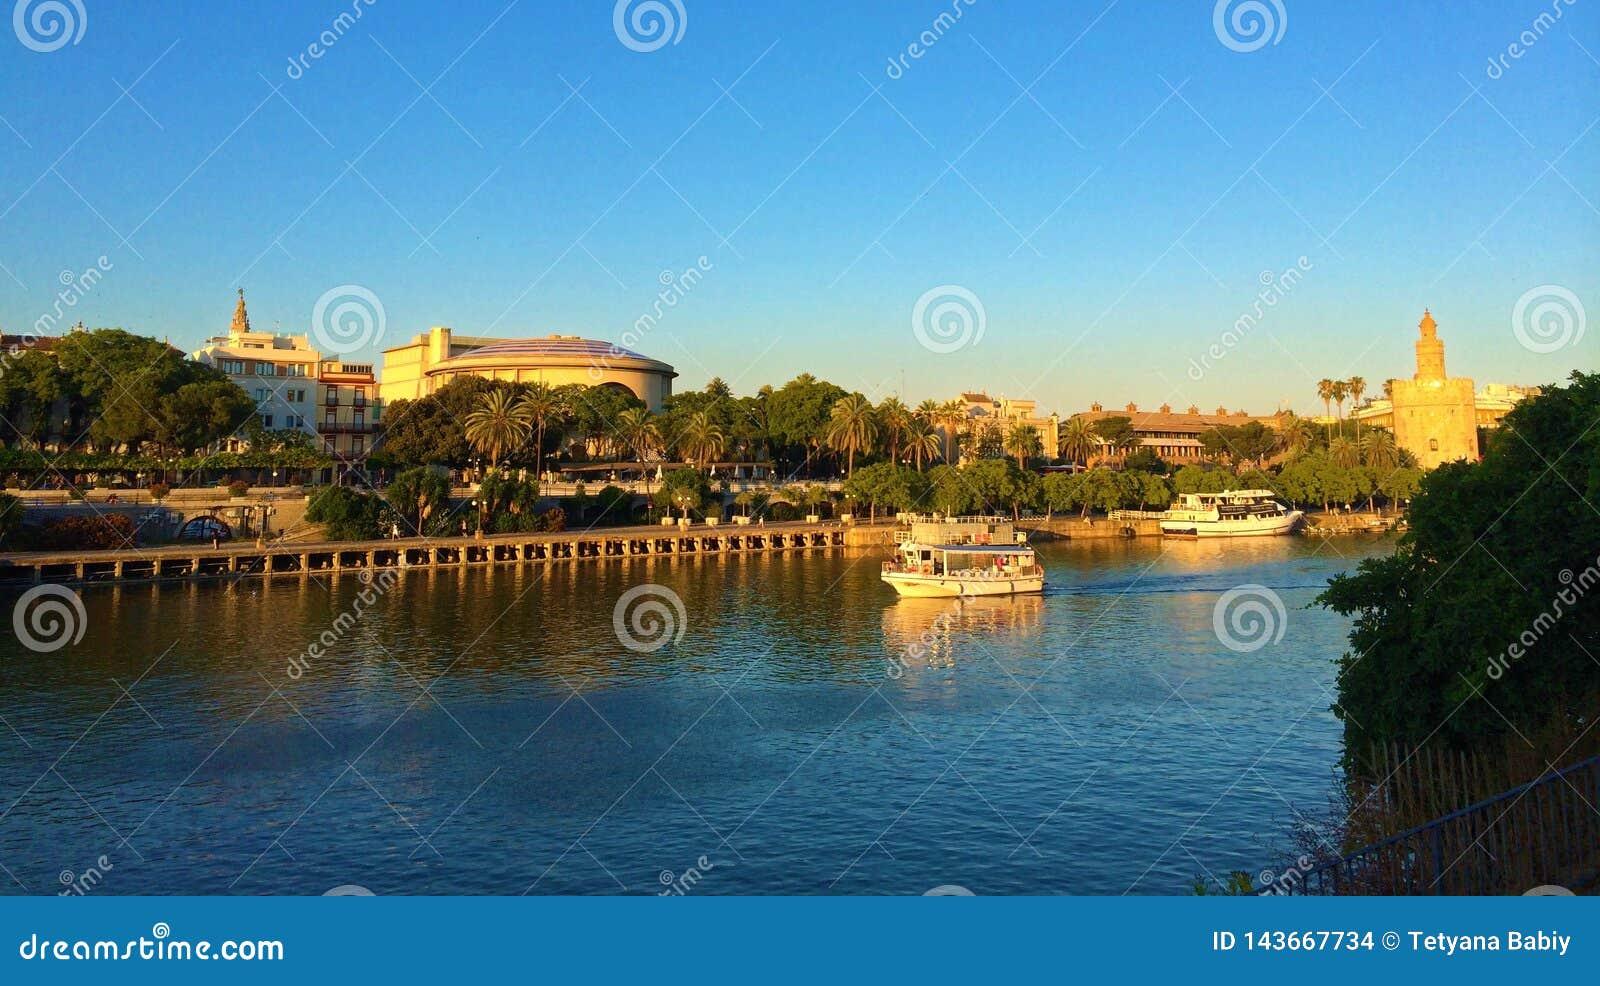 Seville, Spain - Guadalquivir River and Torre del Oro